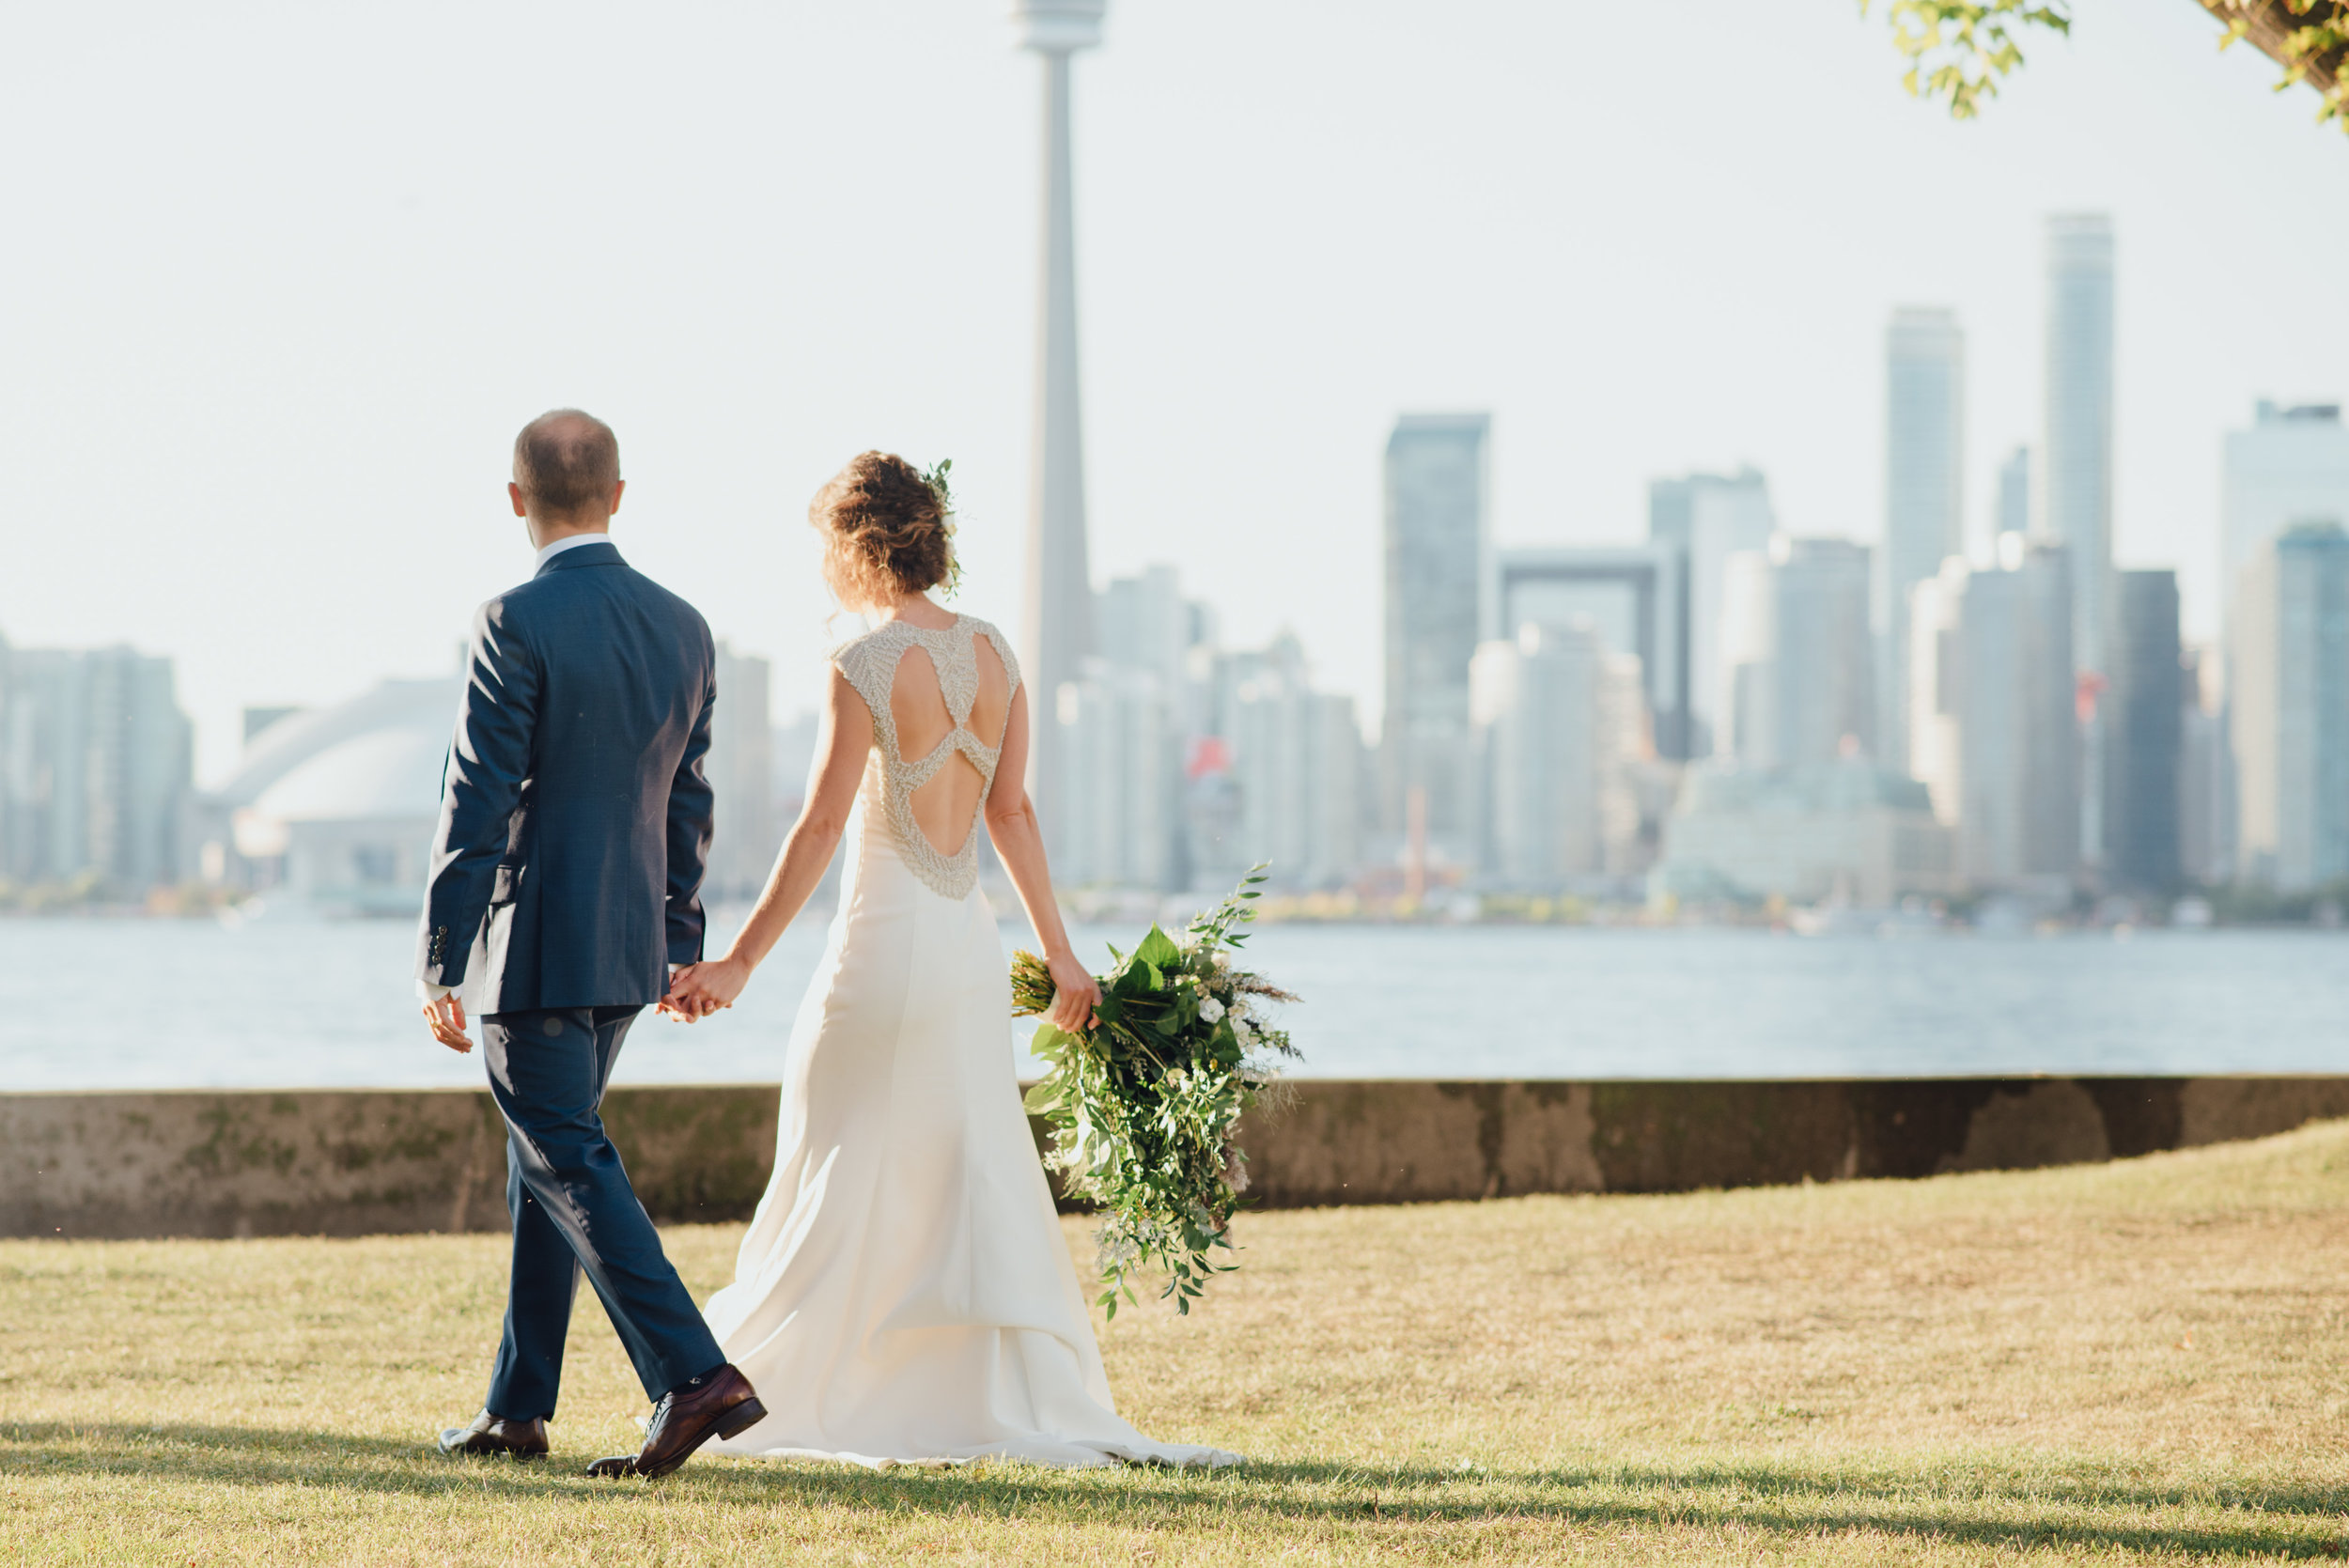 cleland-studios-wedding-photography-62.jpg